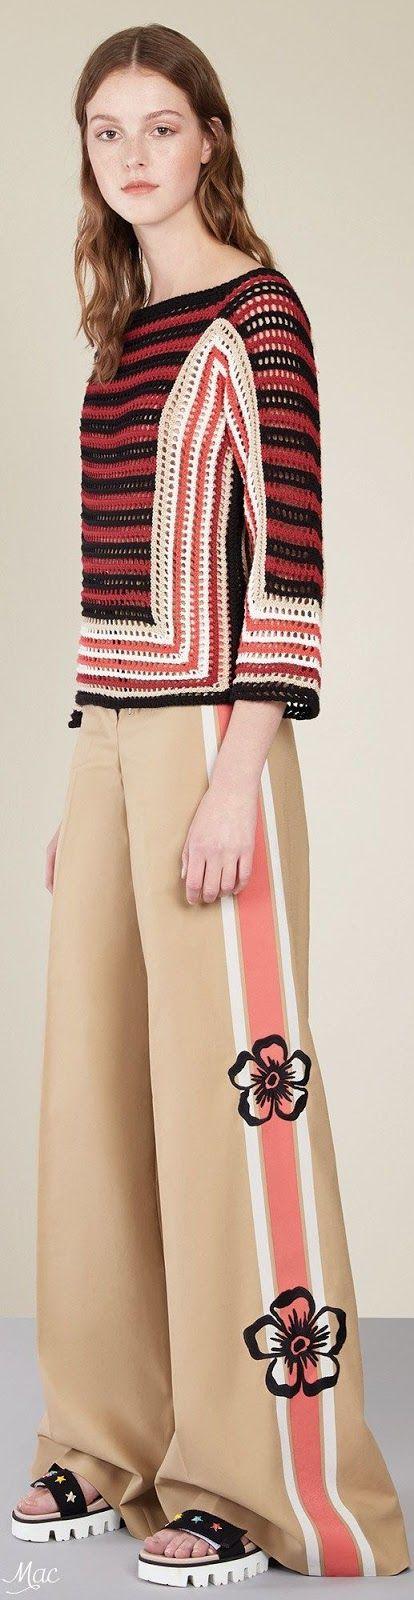 Crochet Blusa | Crochet e moda | Bloglovin'